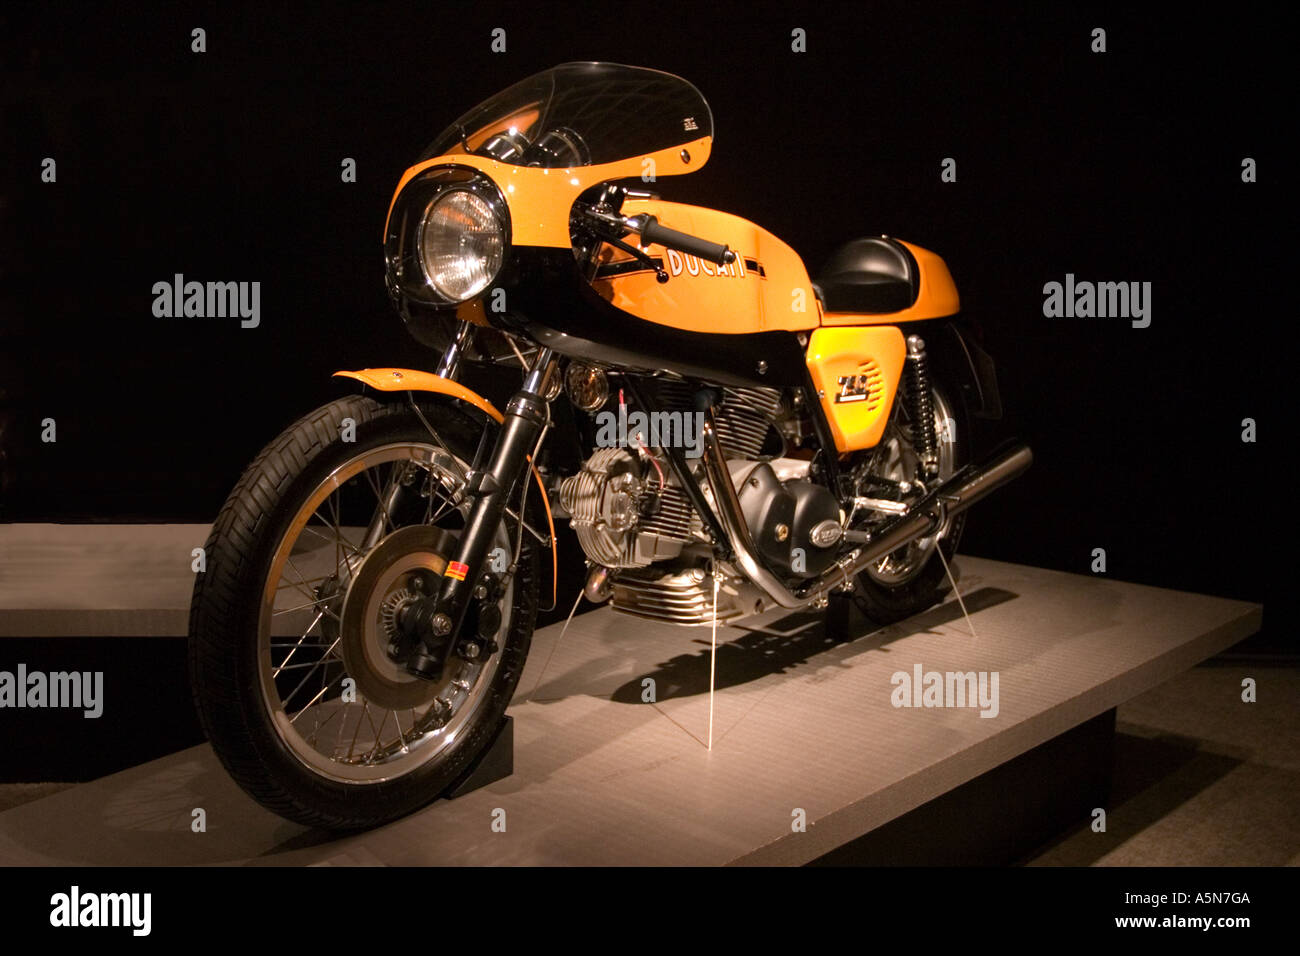 1973 Italian Ducati 750 Sport motorcycle - Stock Image